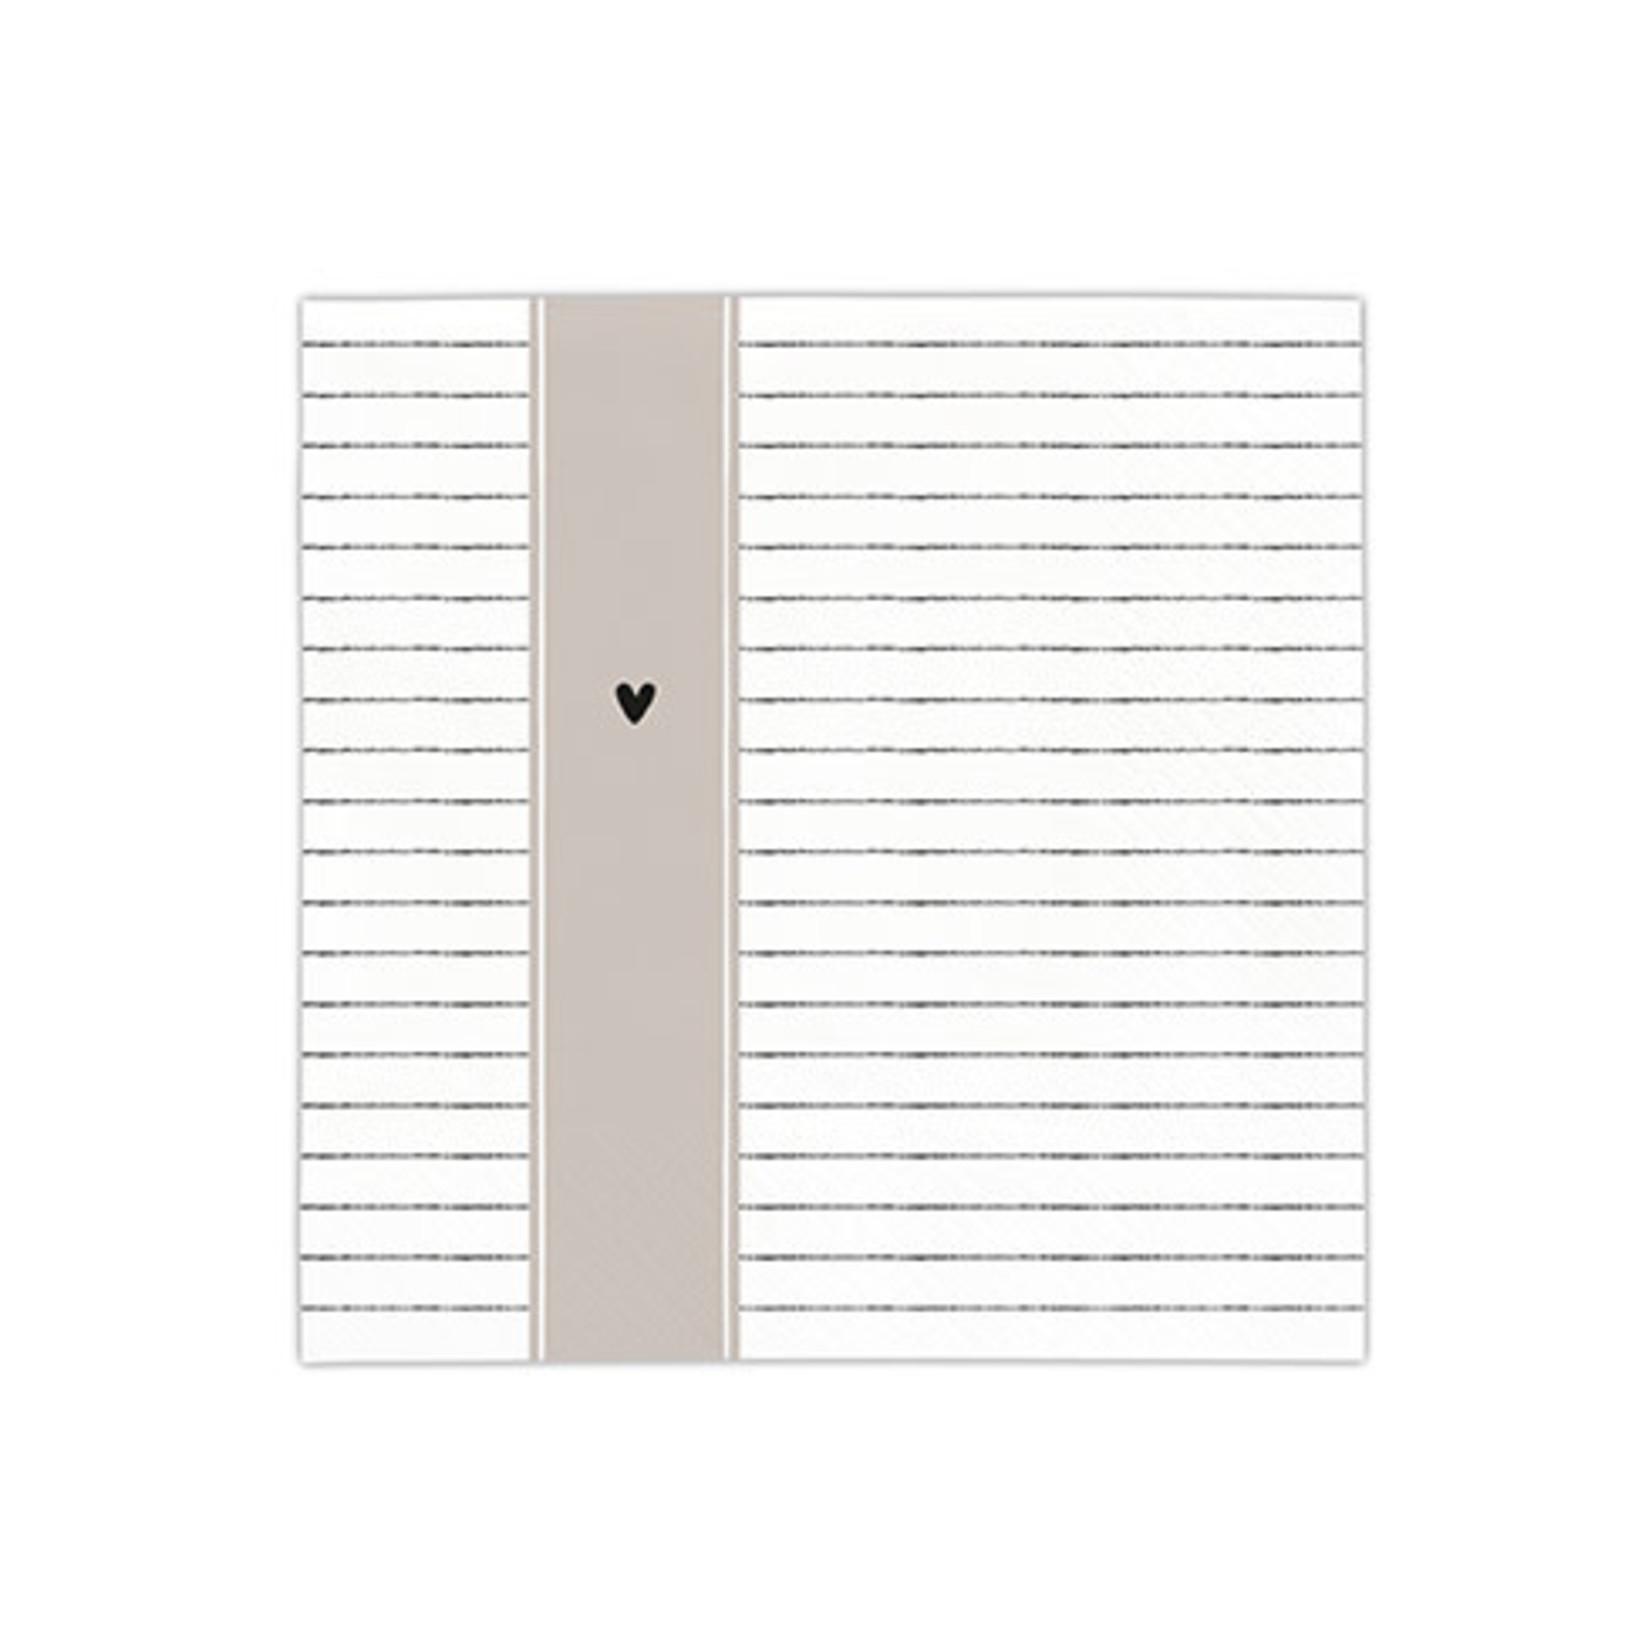 Bastion Collections Napkin White Stripes Smile in Black/Titane 20 pcs